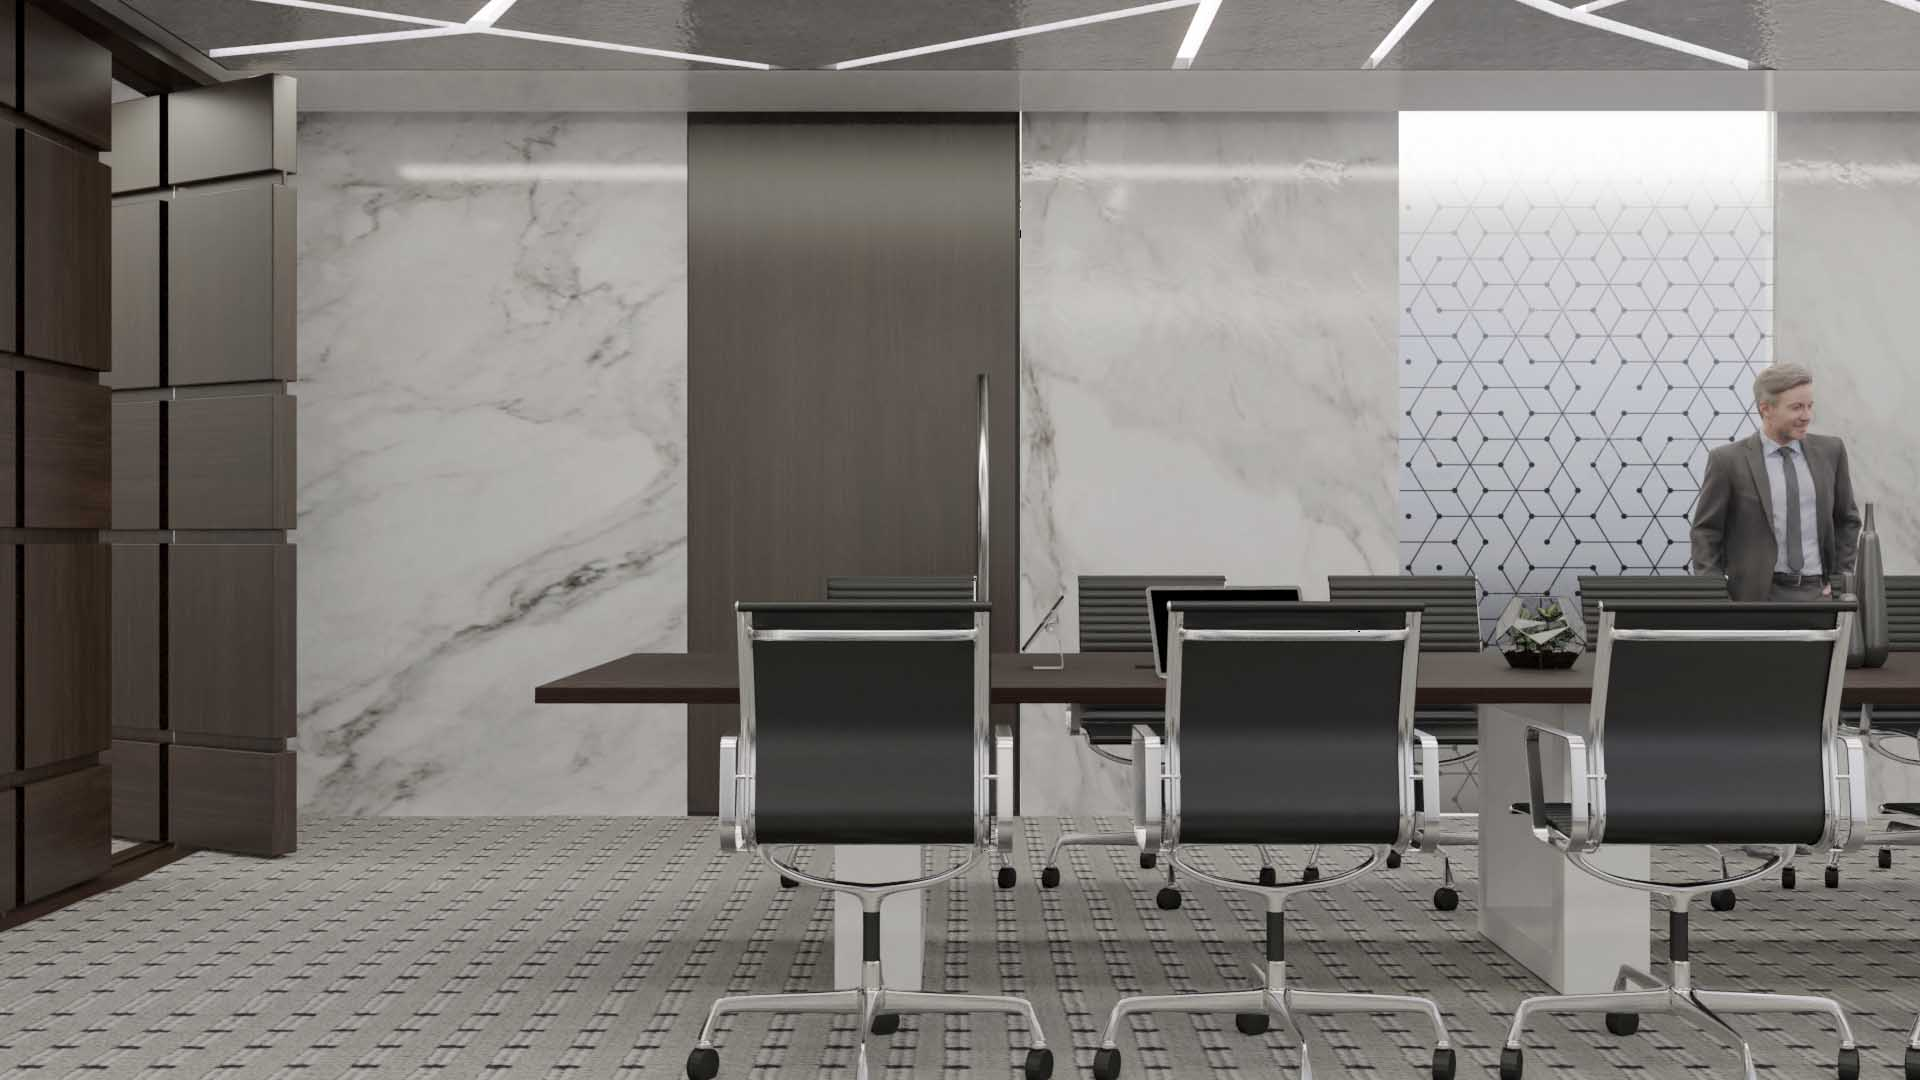 Boardroomwalls_Ramco_Serenity interiors.